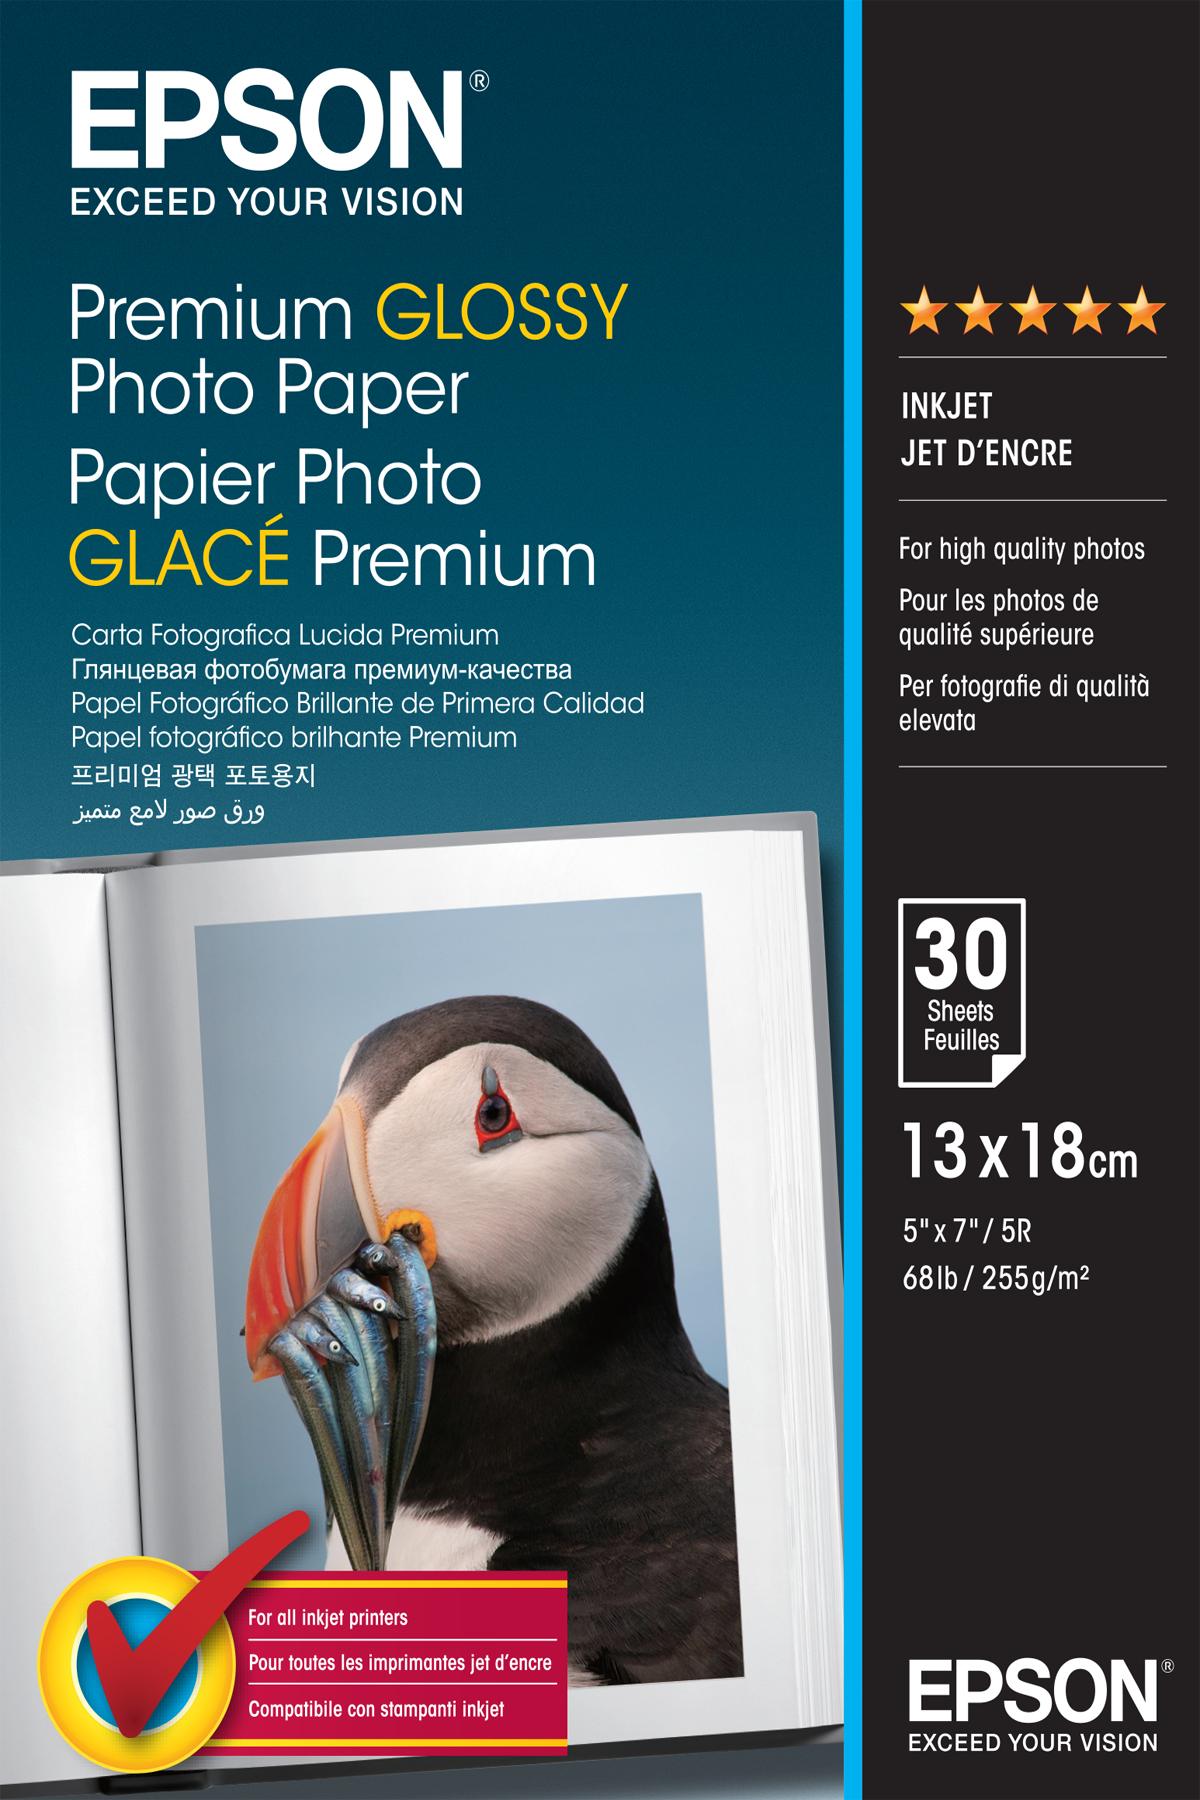 Epson Premium Glossy - 13x18cm - 30 Sheets photo paper